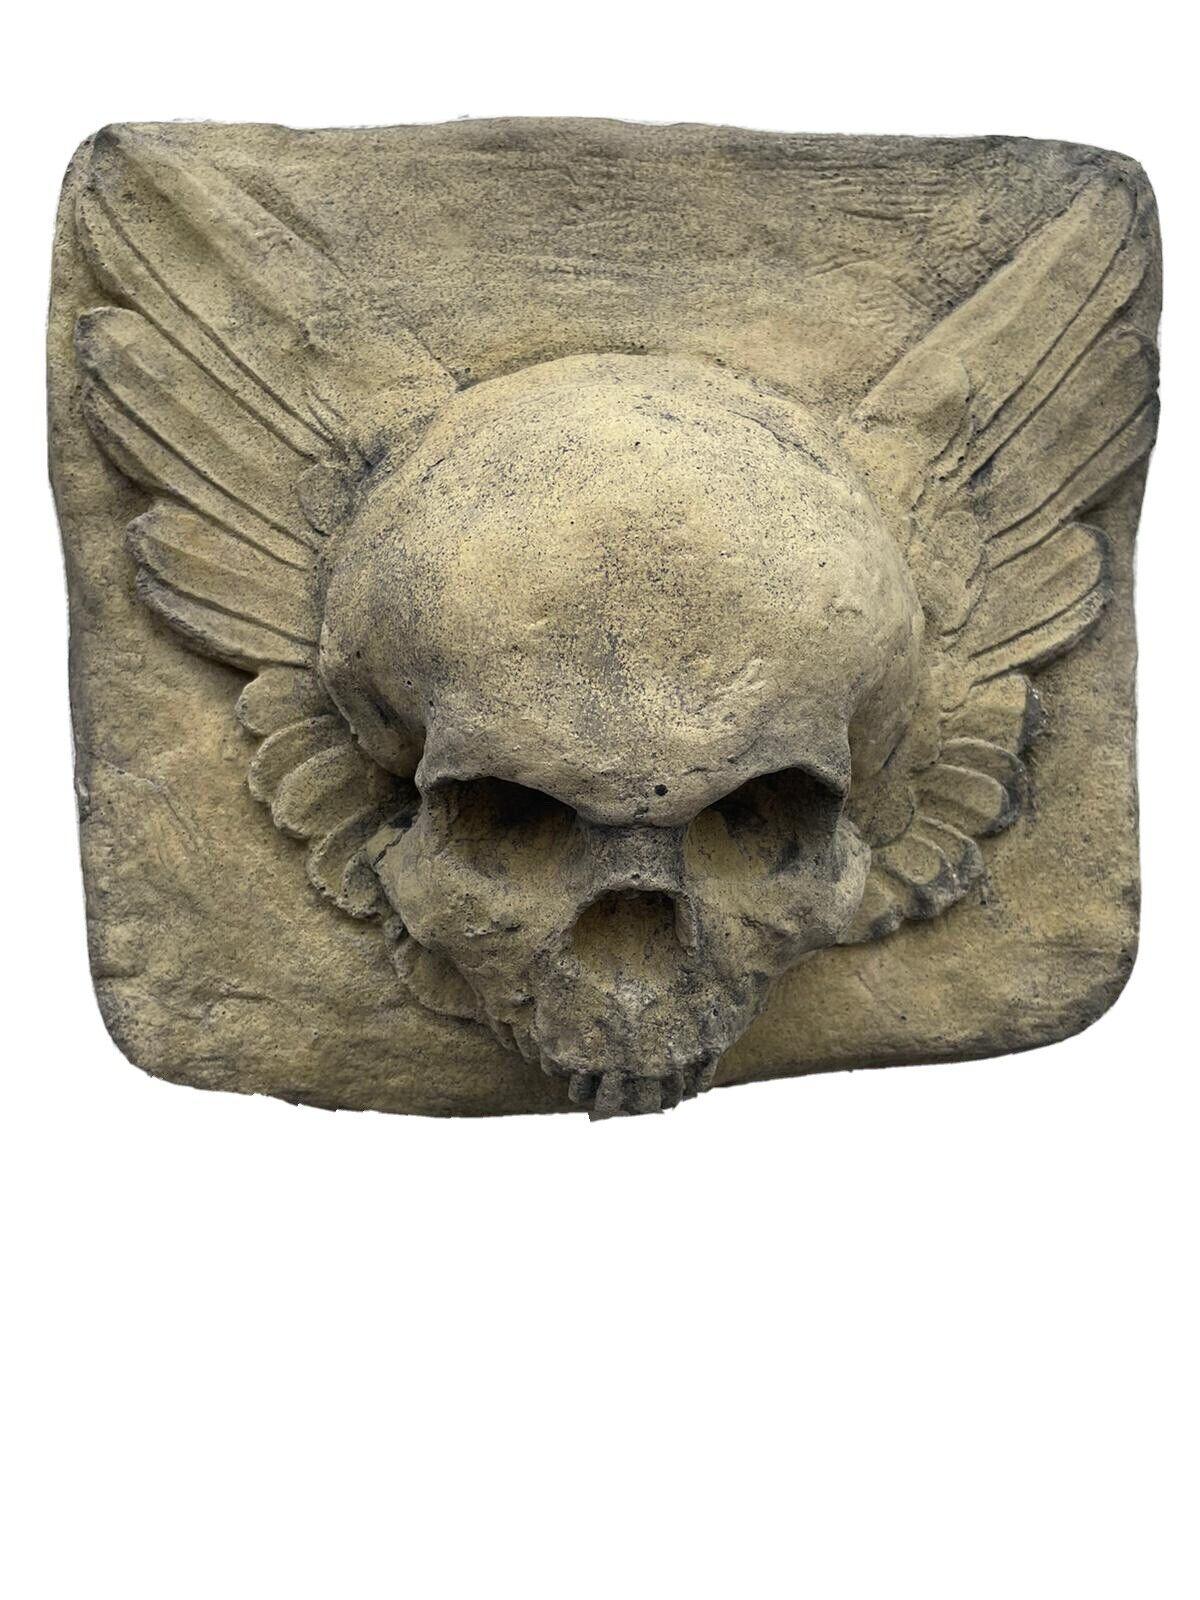 Winged Skull Wall Plaque gothic wall plaque stone Biker wall art 28cm x 23cm